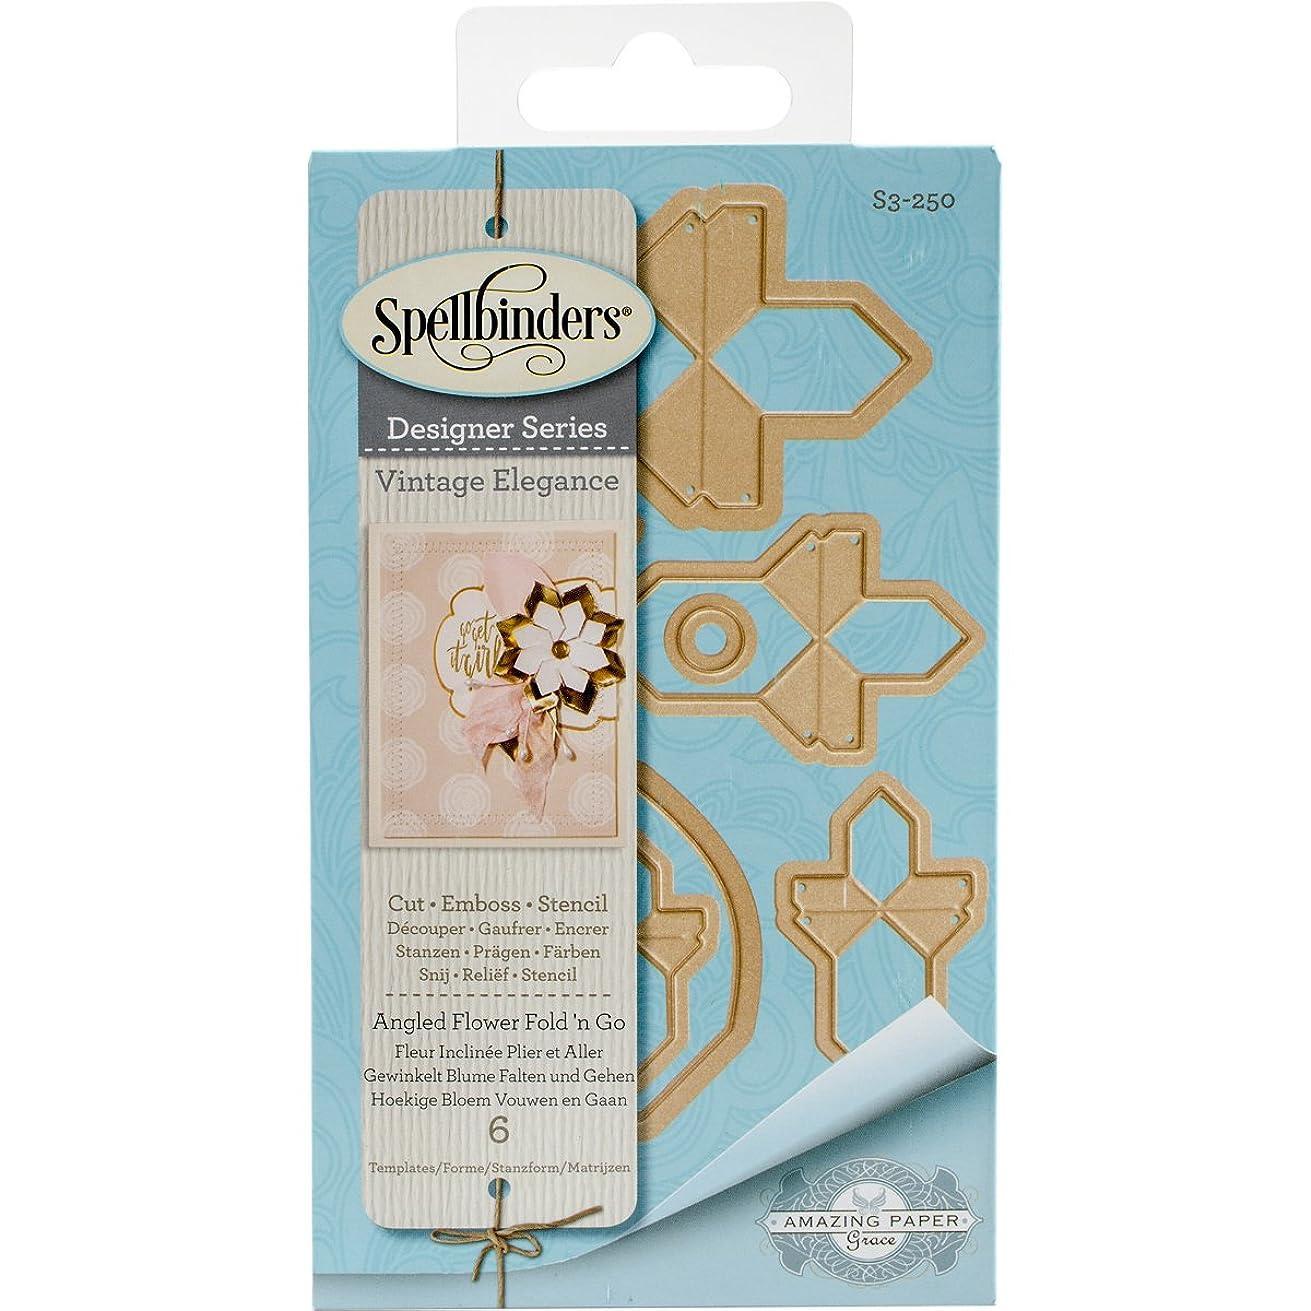 Spellbinders Angeled Flower Fold 'N Go Etched/Wafer Thin Dies